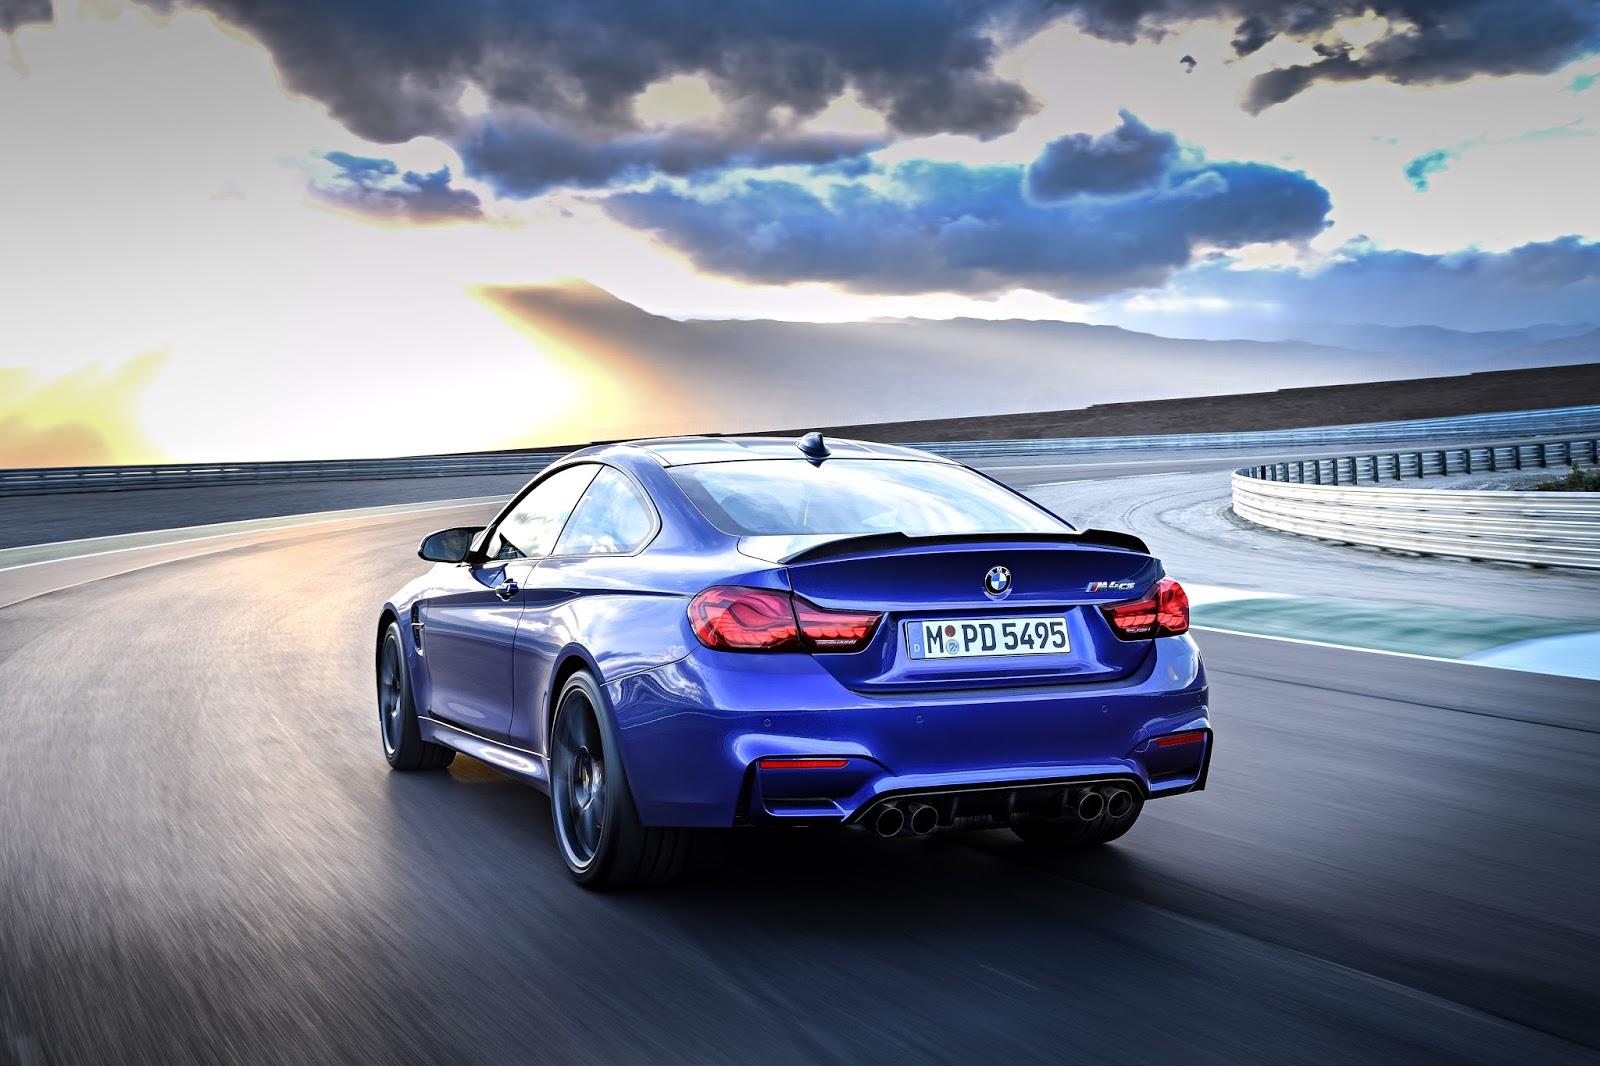 P90251042 highRes the new bmw m4 cs 04 Η περιορισμένης παραγωγής BMW M4 ClubSport δική σας με 116.900 ευρώ BMW, BMW M, BMW M4, BMW M4 CS, BMW Motorsport, clubsport, COUPE, Limited edition, supercars, supersport, videos, Περιορισμένης παραγωγής